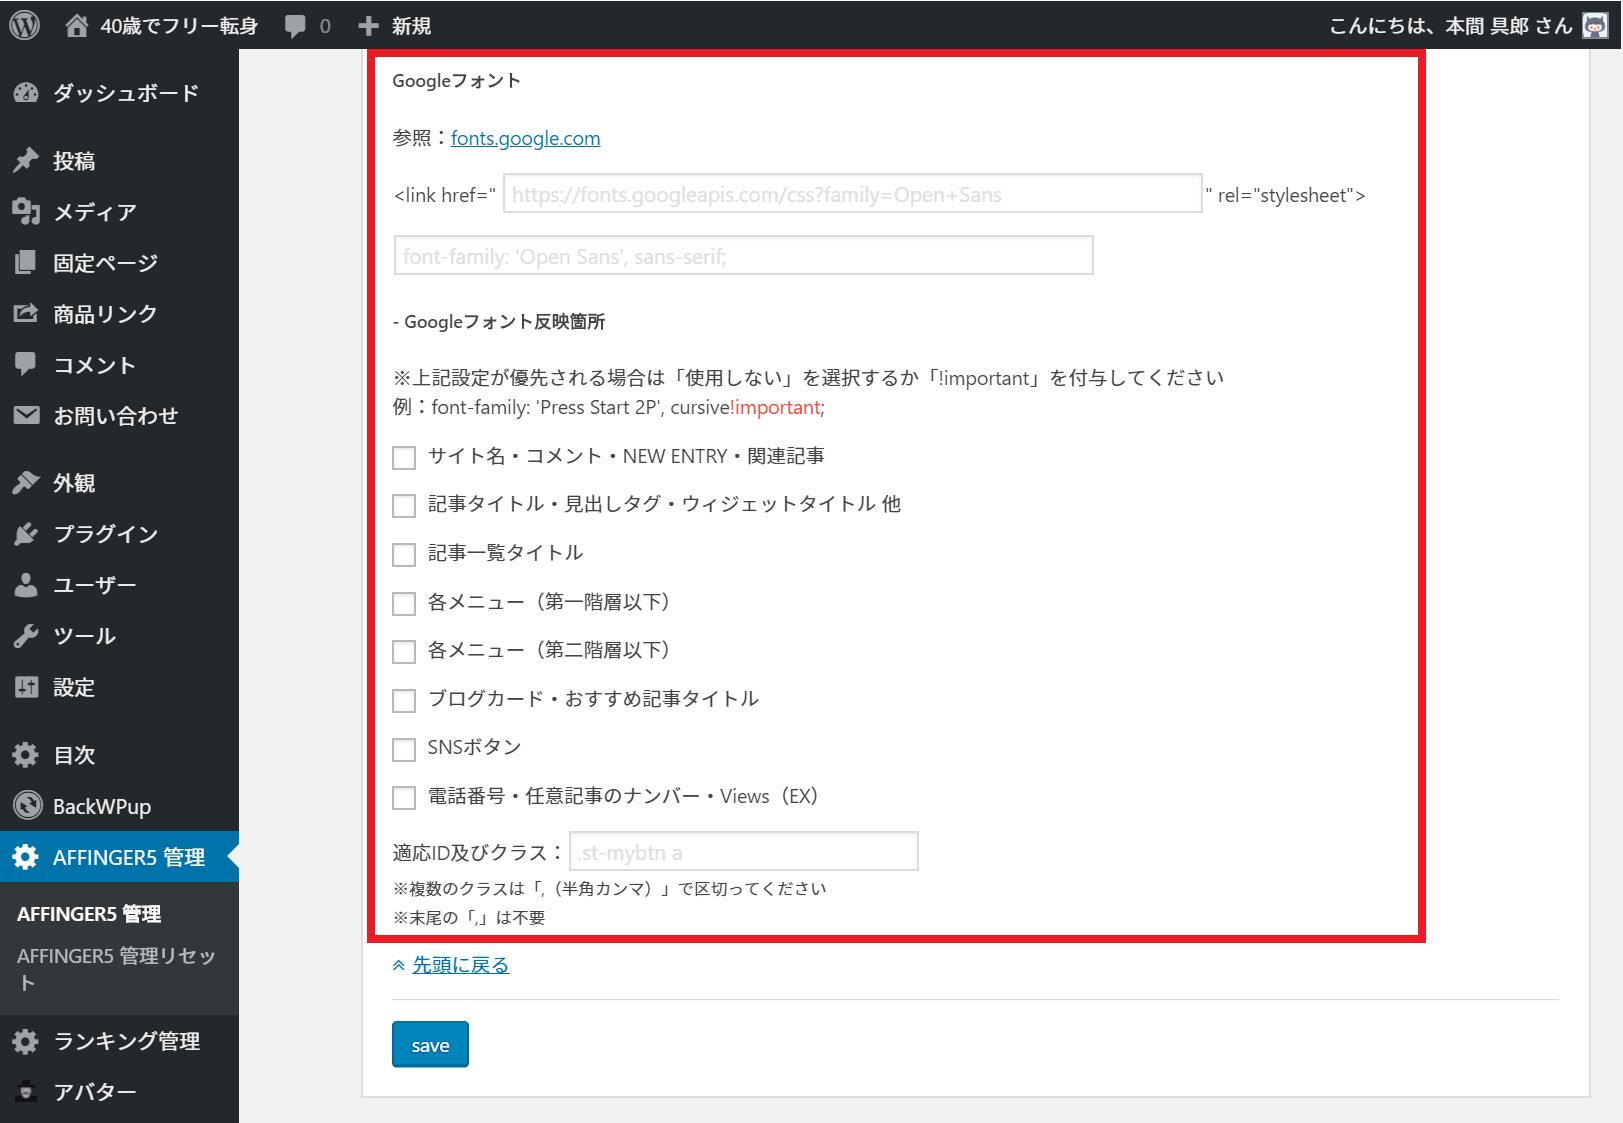 AFFINGER5管理のGoogleフォント設定をぜんぶ外す!